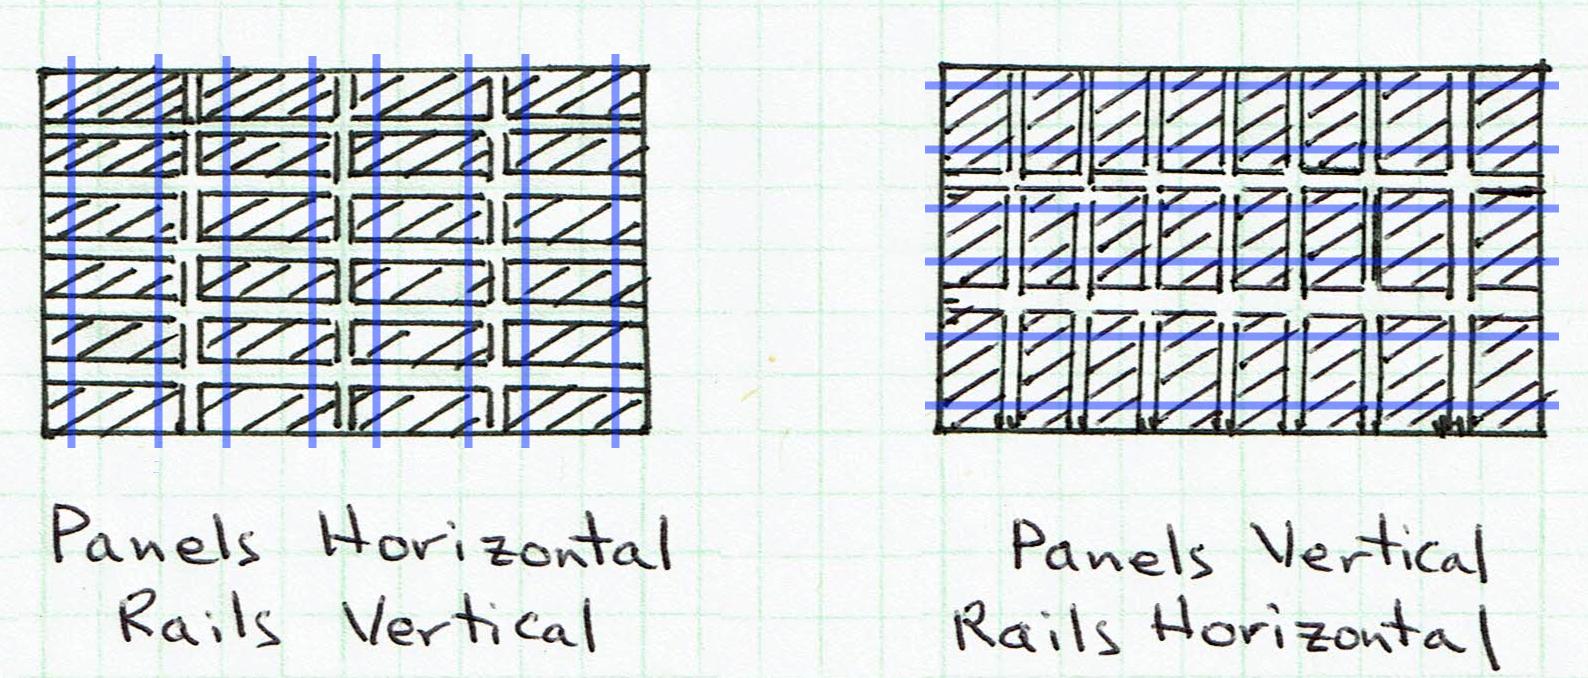 plot solar panel layout options